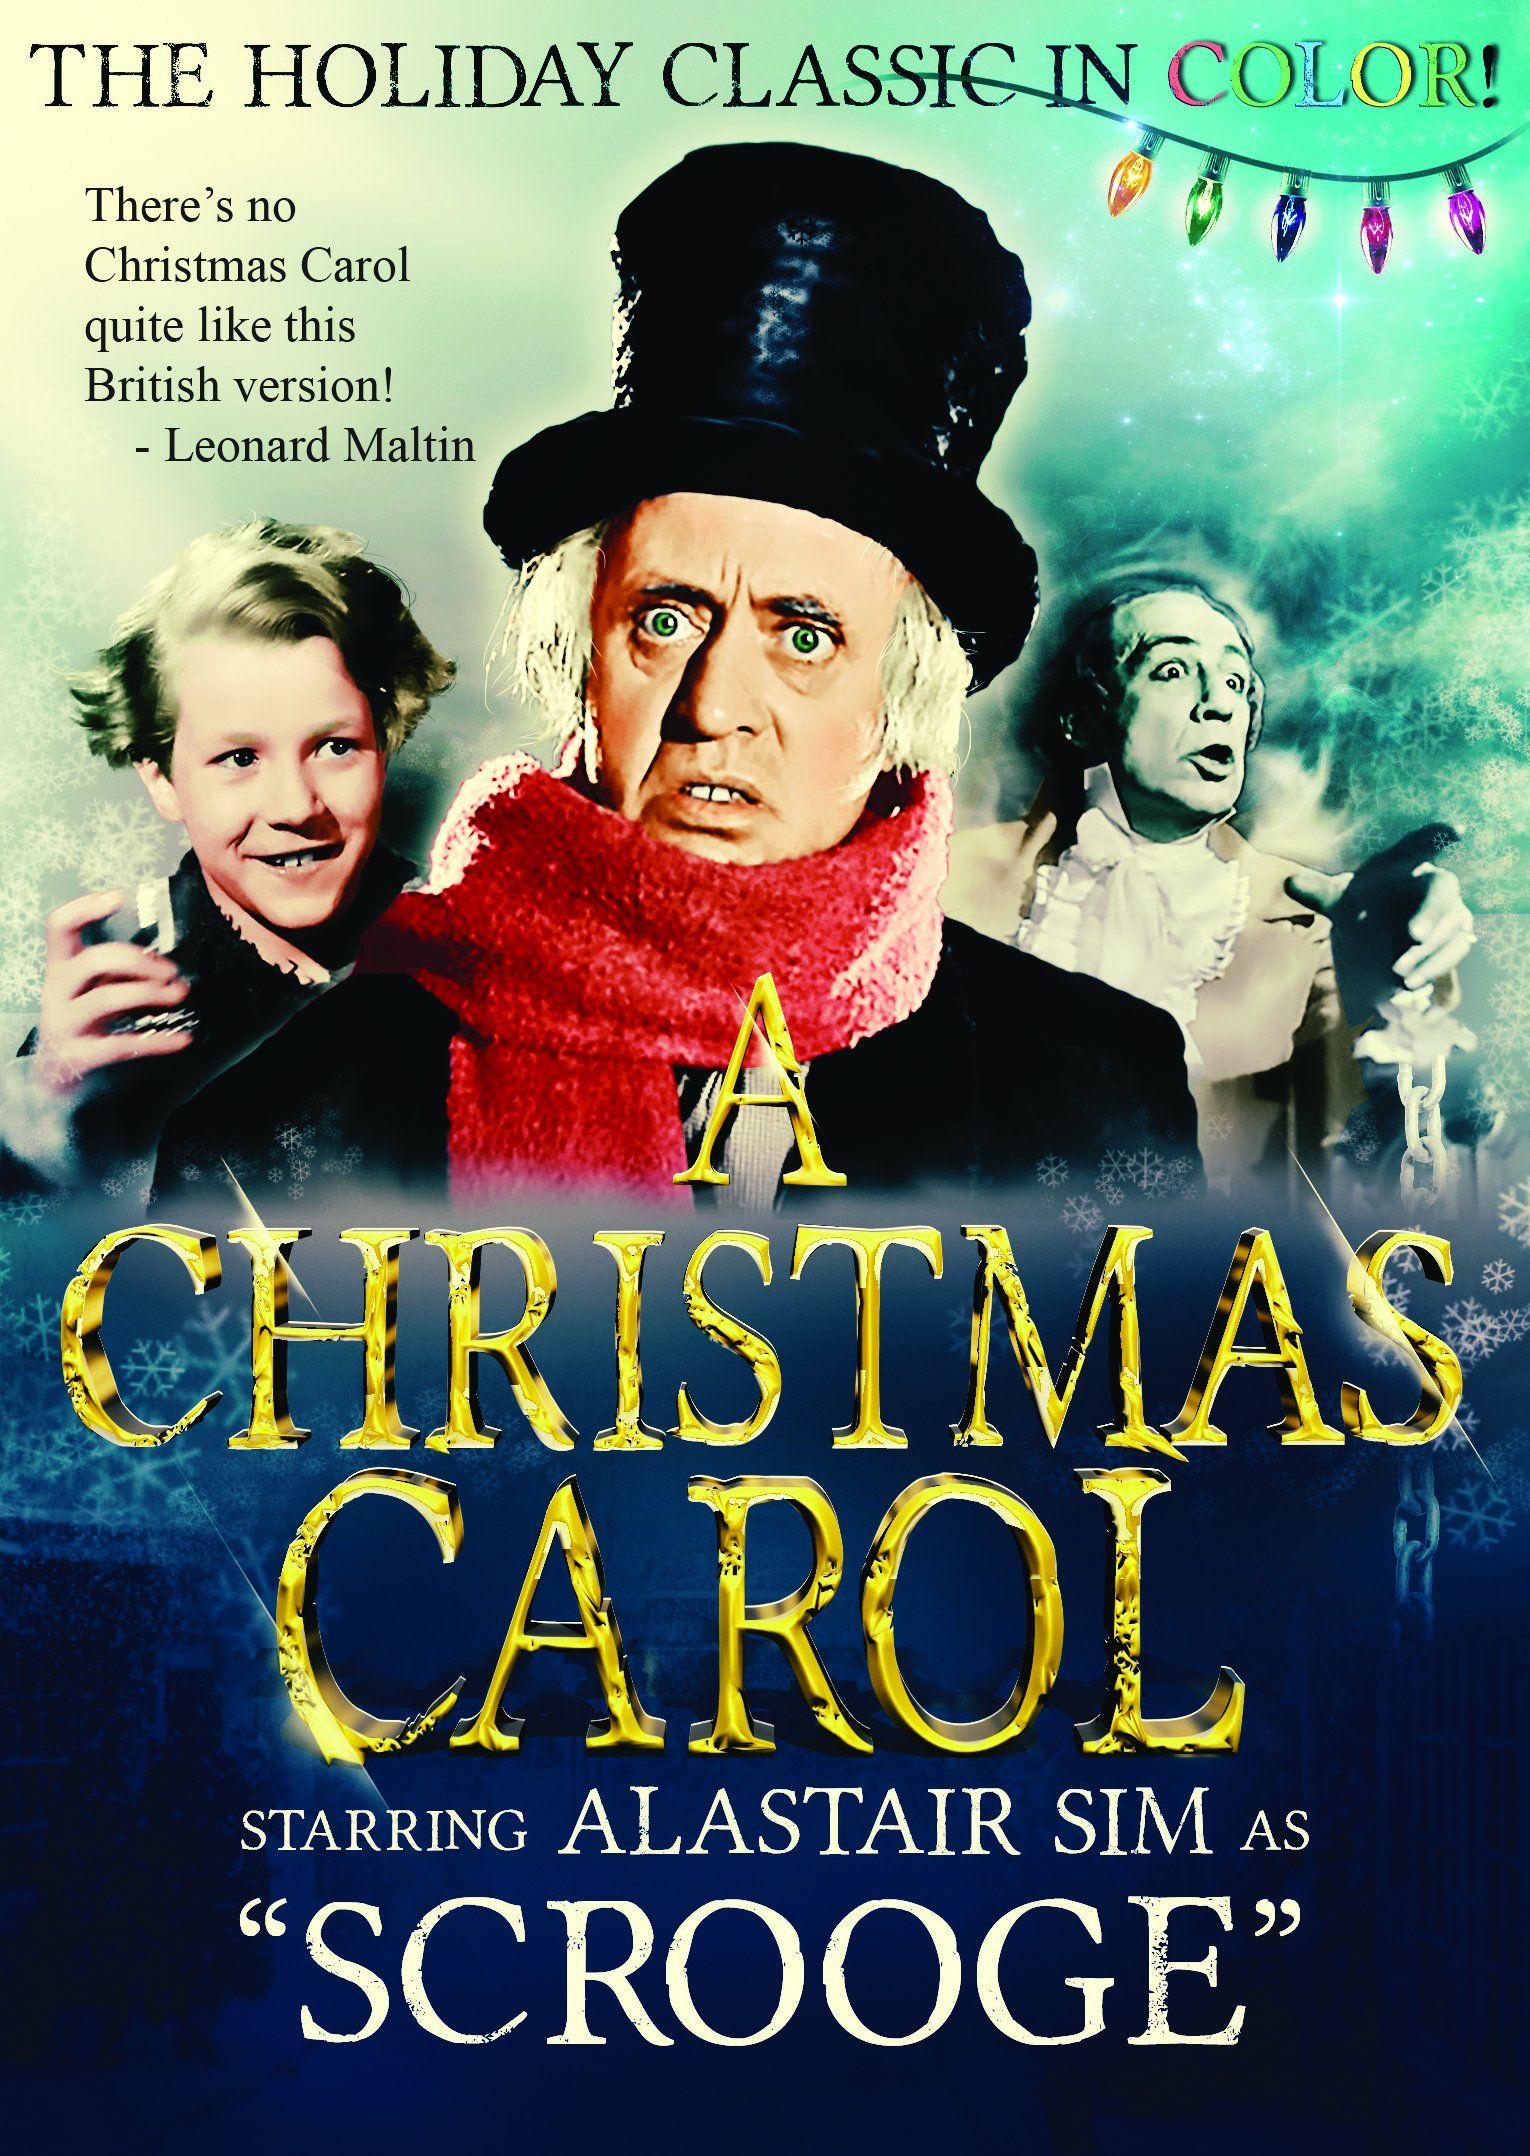 Amazon Com A Christmas Carol Alastair Sim Kathleen Harrison Jack Warner Mervyn Johns Hermione Baddeley Mi A Christmas Carol 1951 Christmas Carol Scrooge